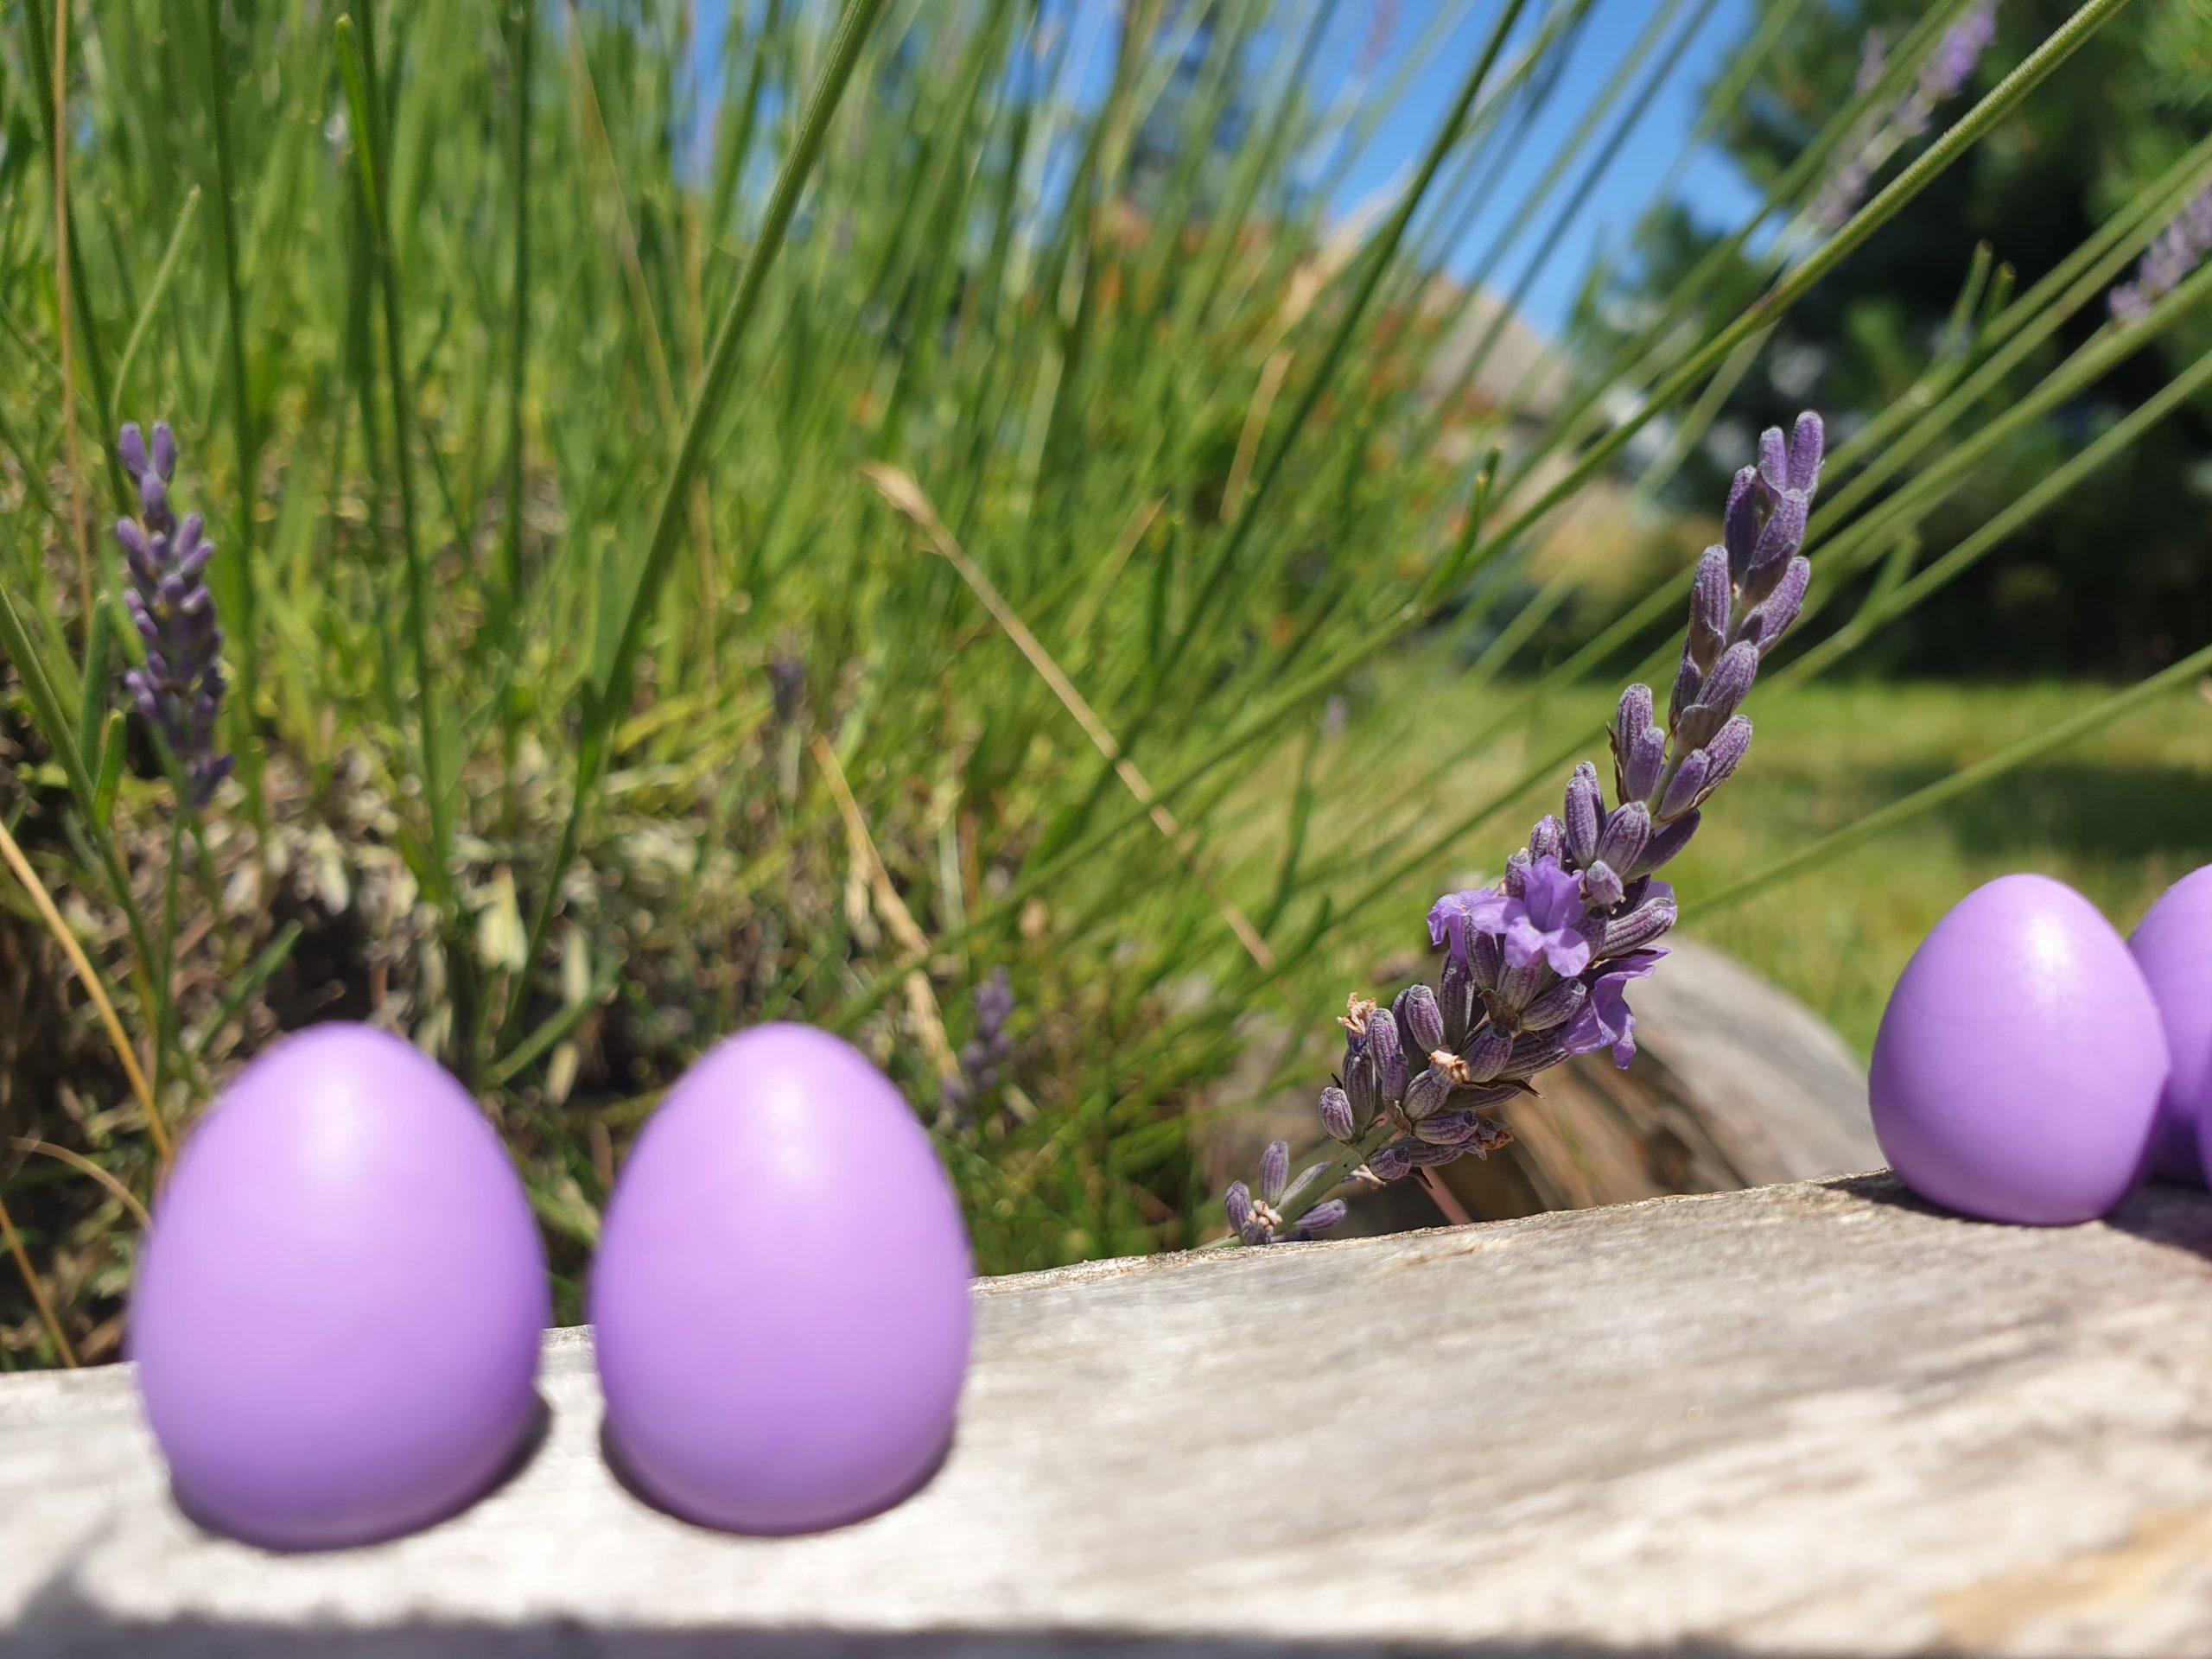 na skrzydłach jaja